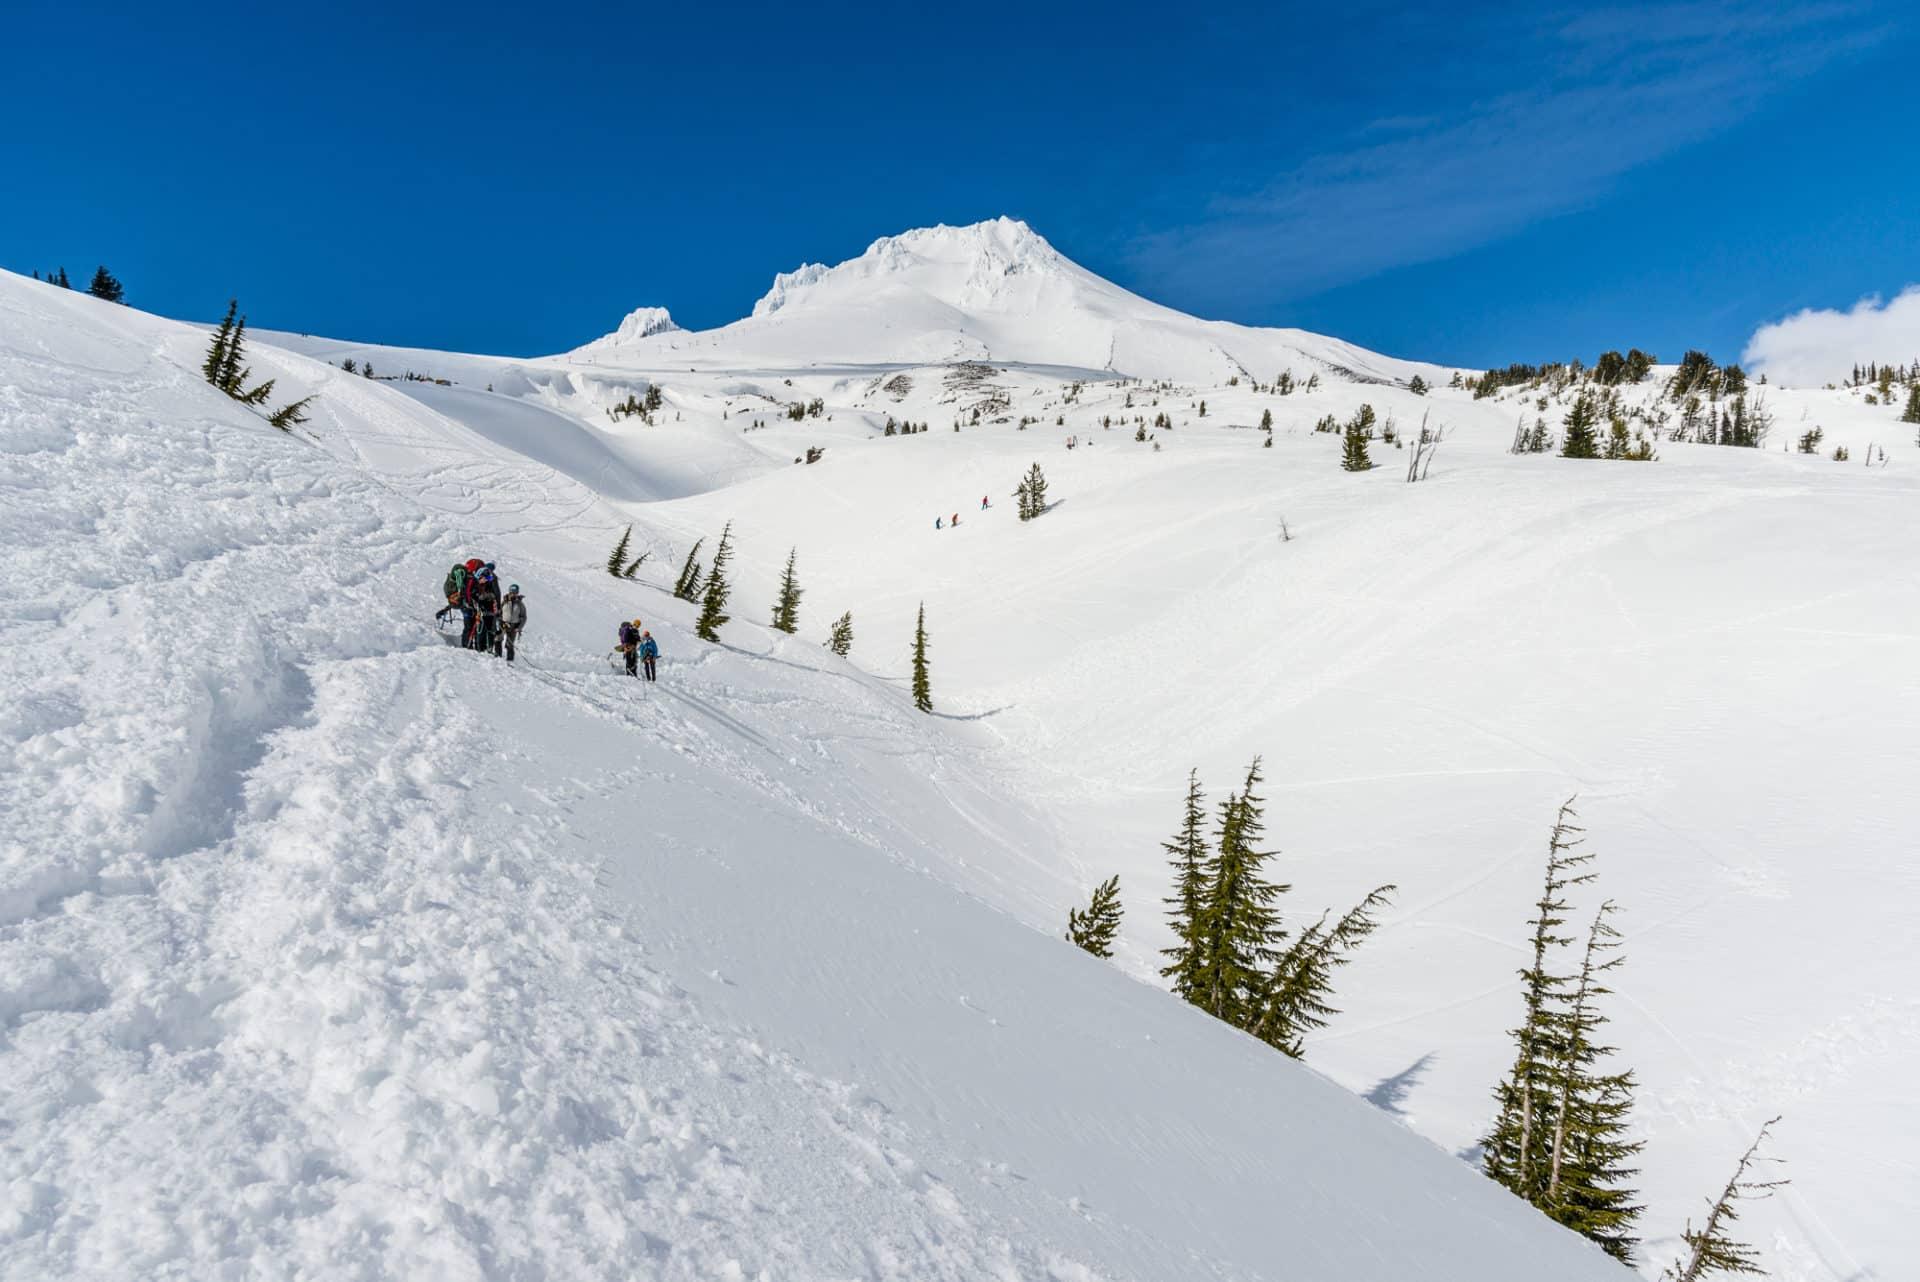 Climbing Mount Hood (3,429m) via Reid Glacier Headwall